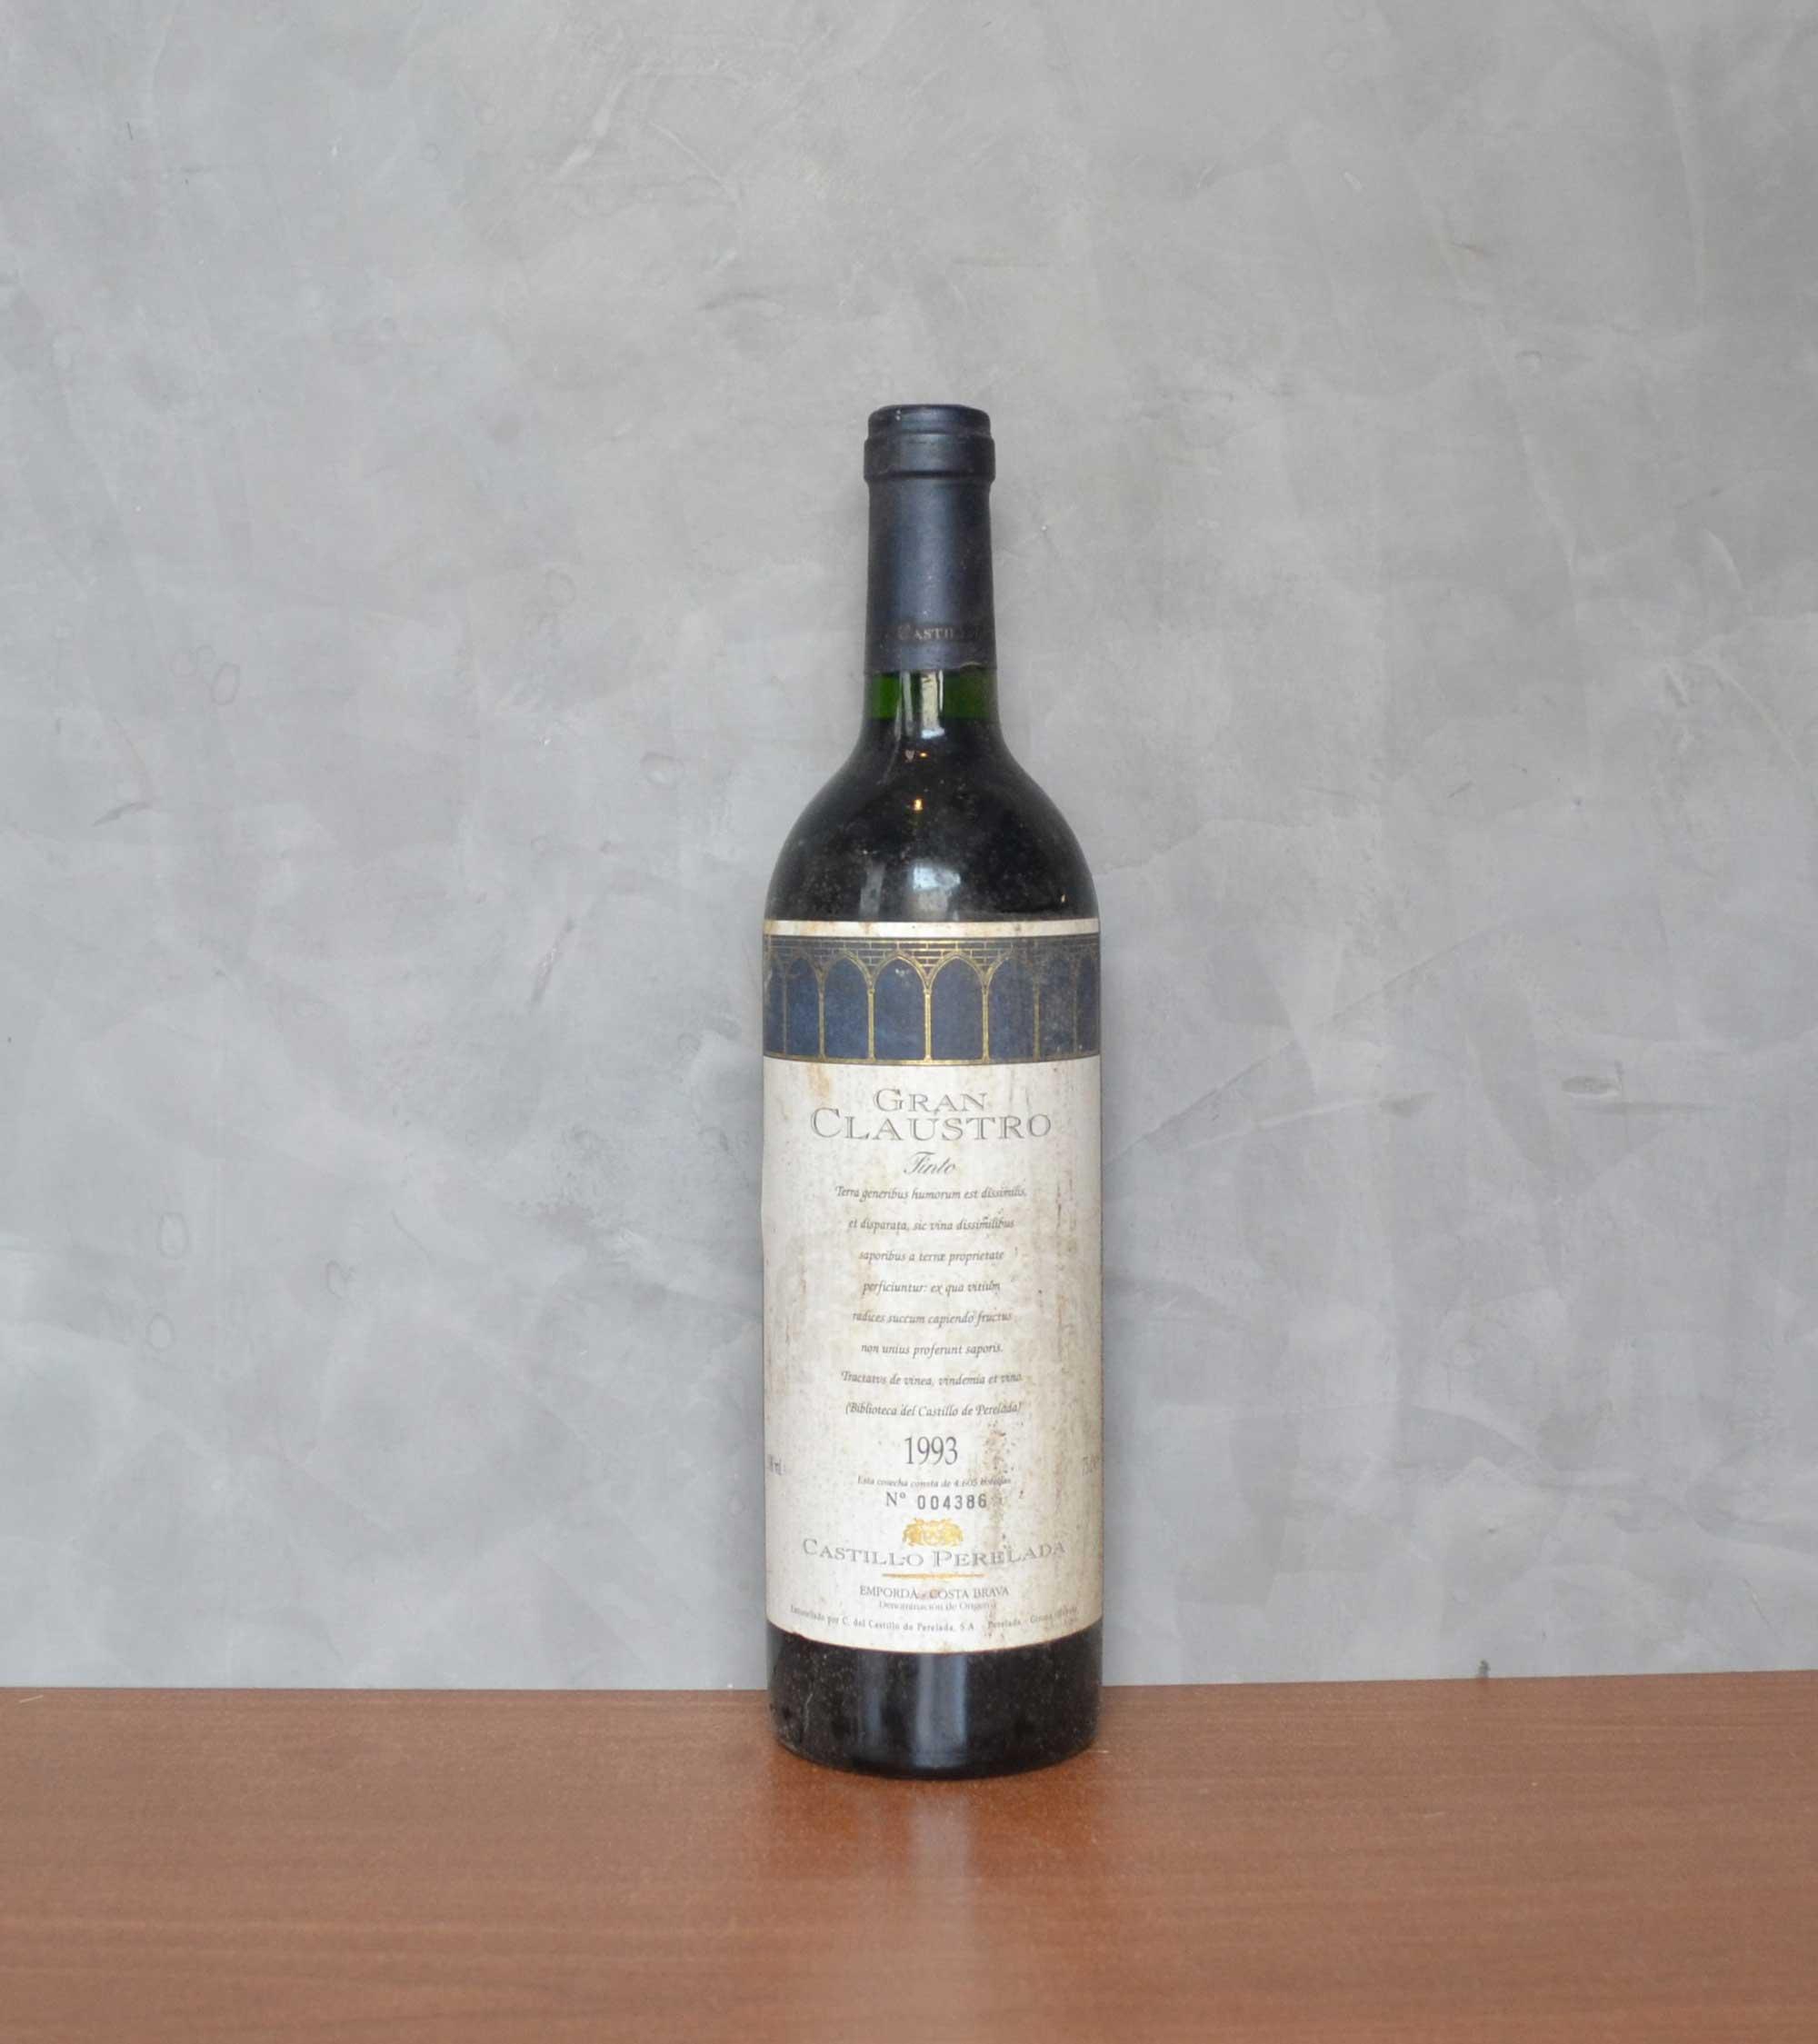 Perelada great cloister 1993